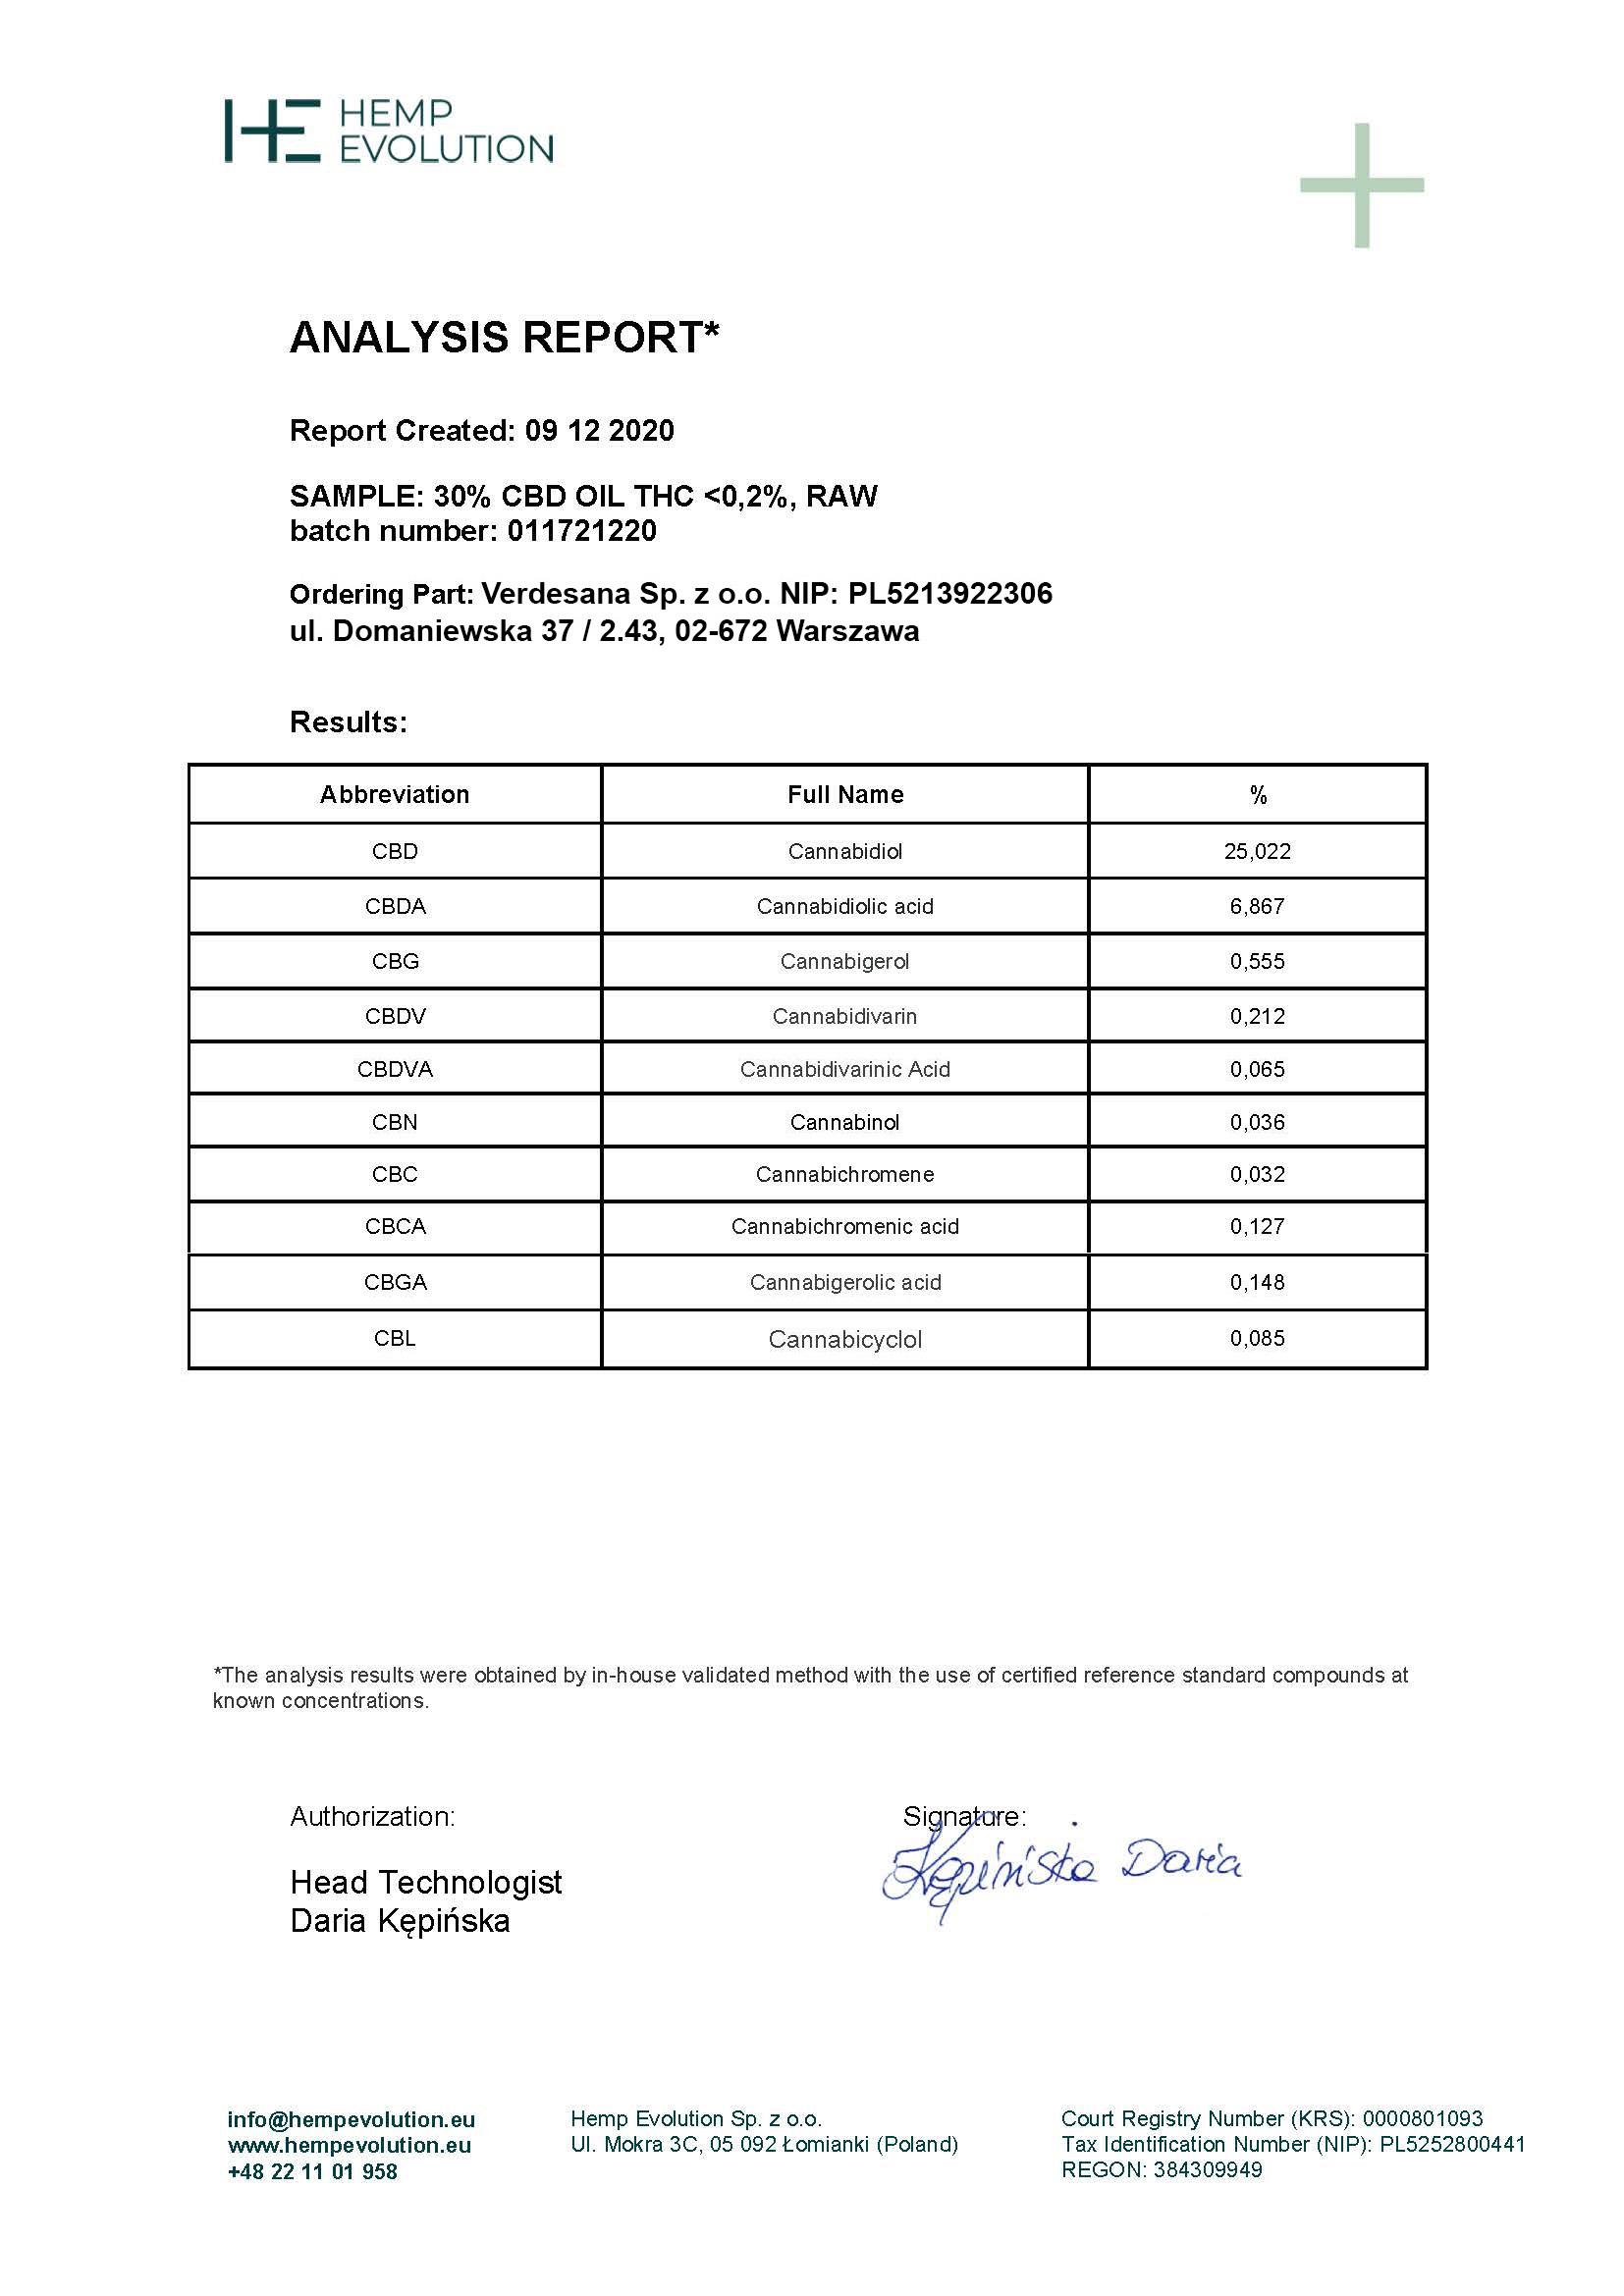 Certyfikat analizy - Verdesana Ekstrakt Konopny 30% CBD THC pon 02% RAW